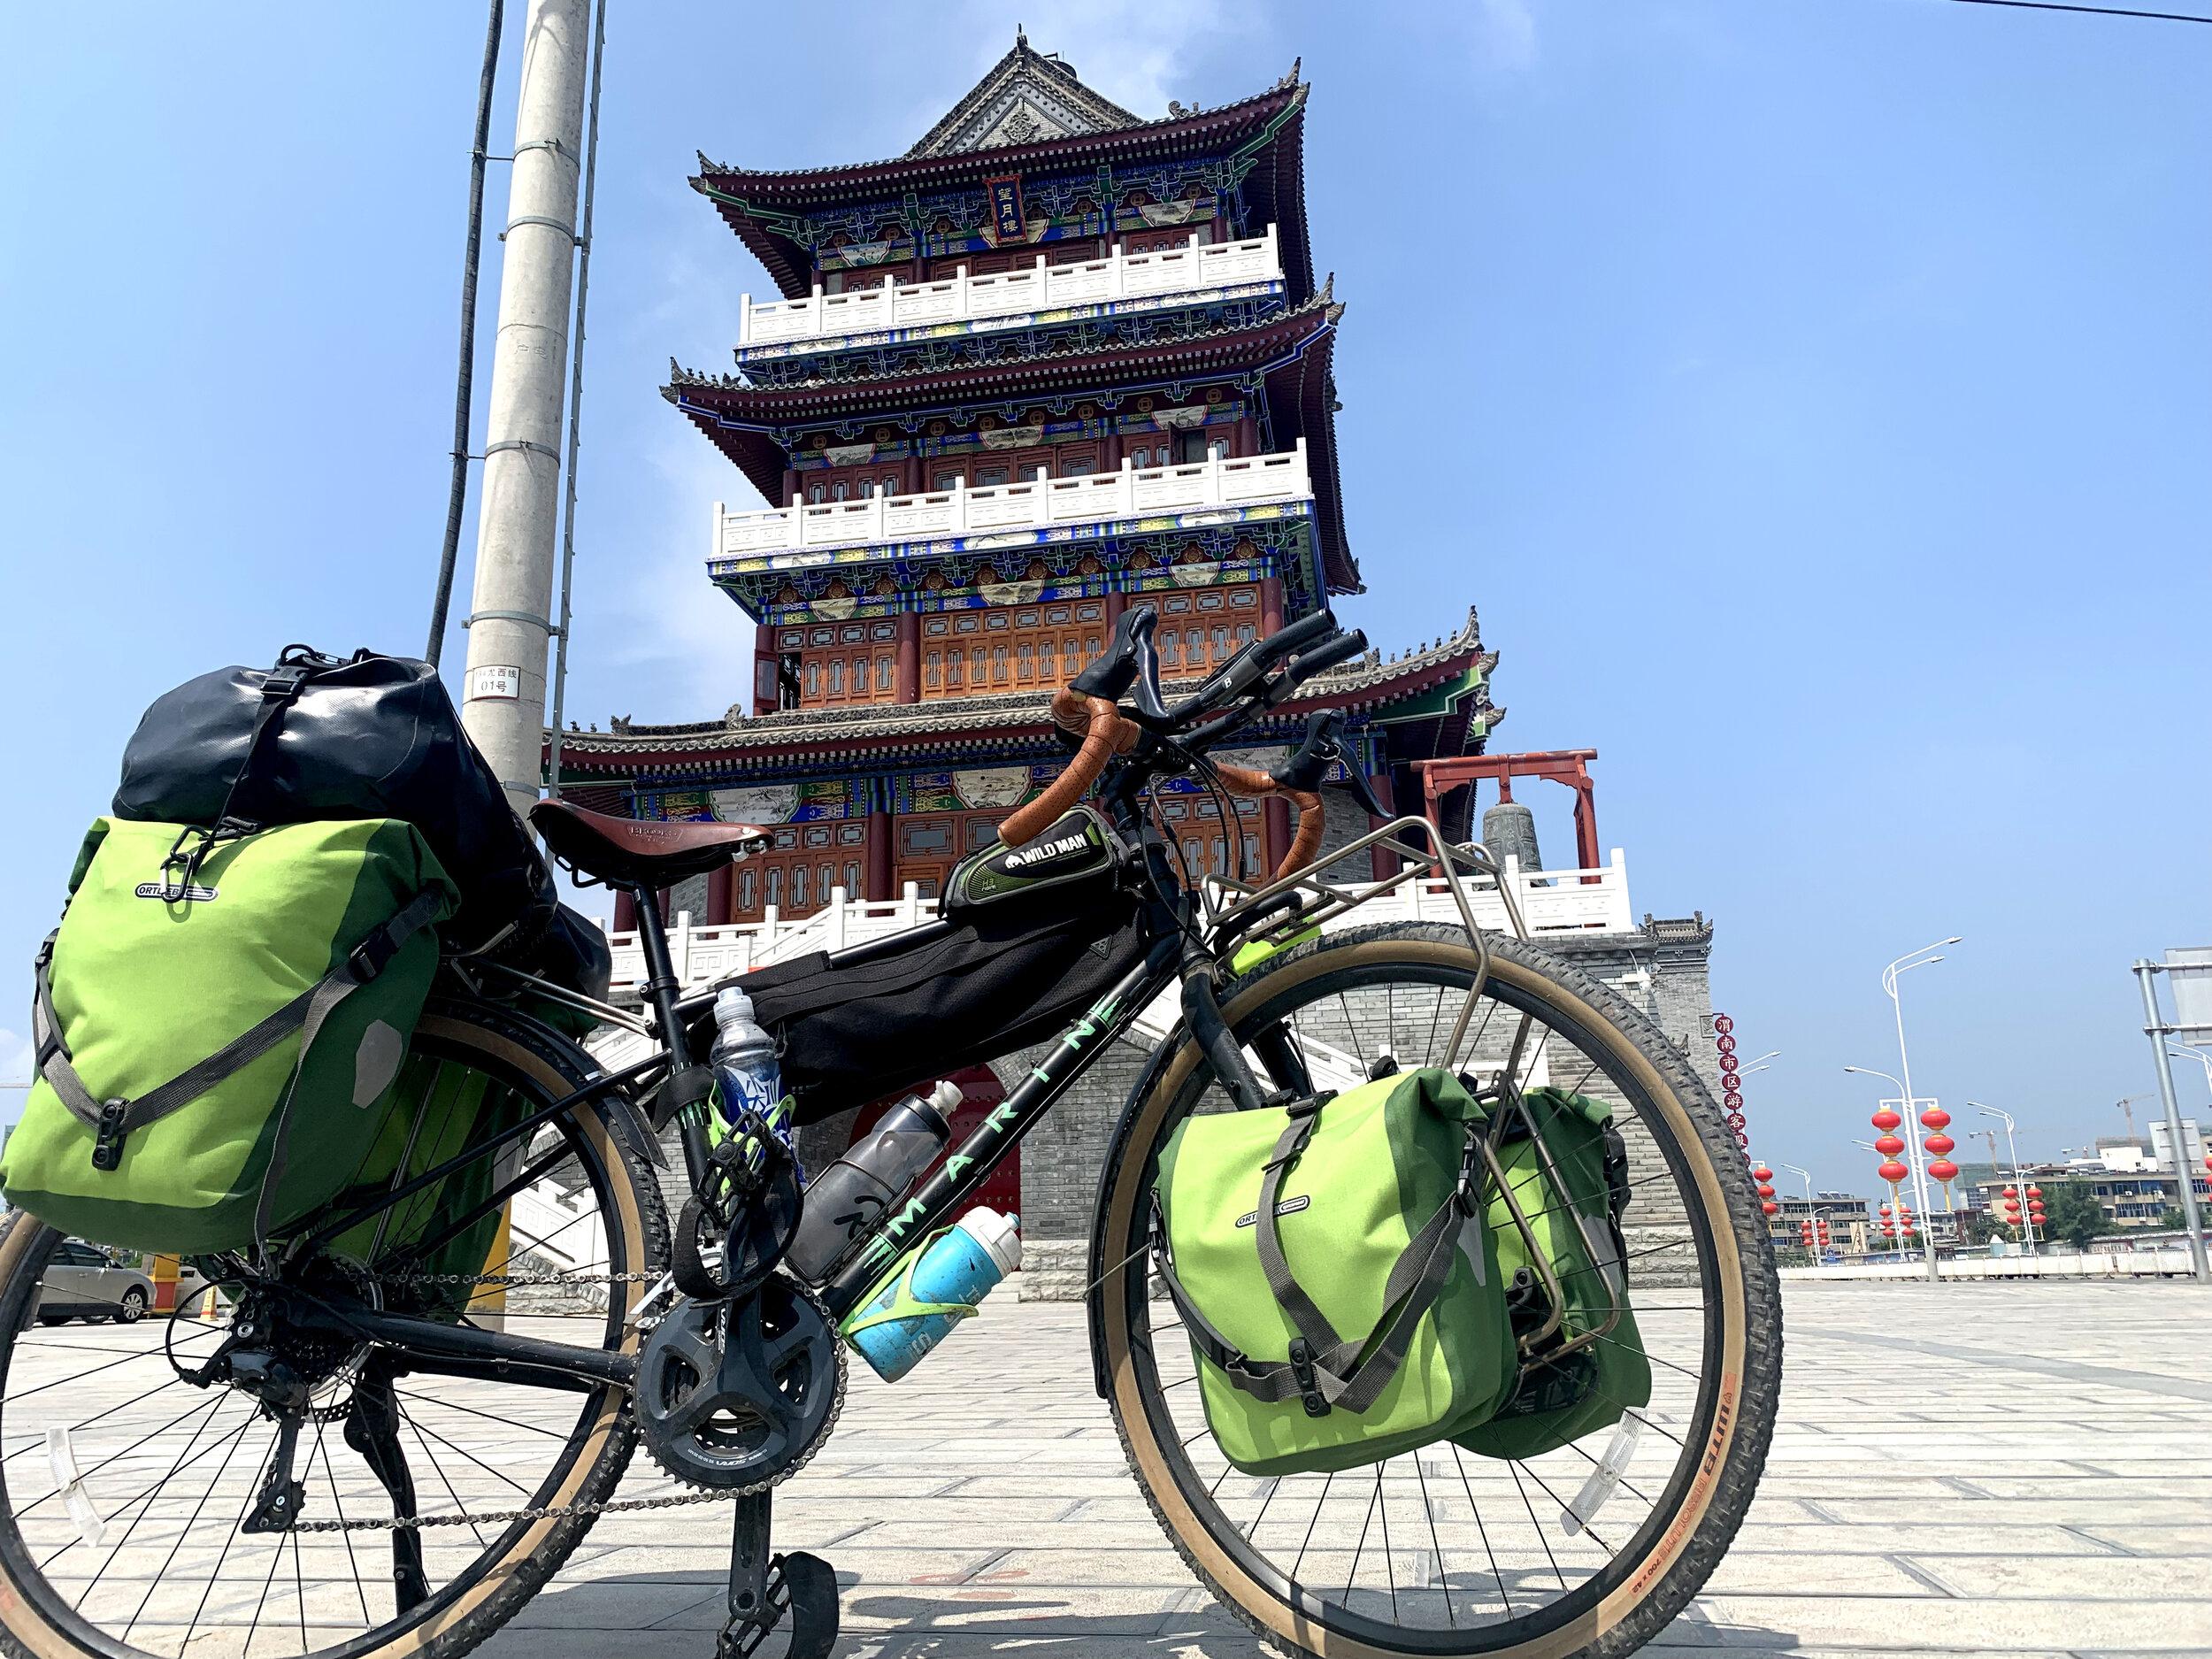 In Xi'an, week three of the trip.